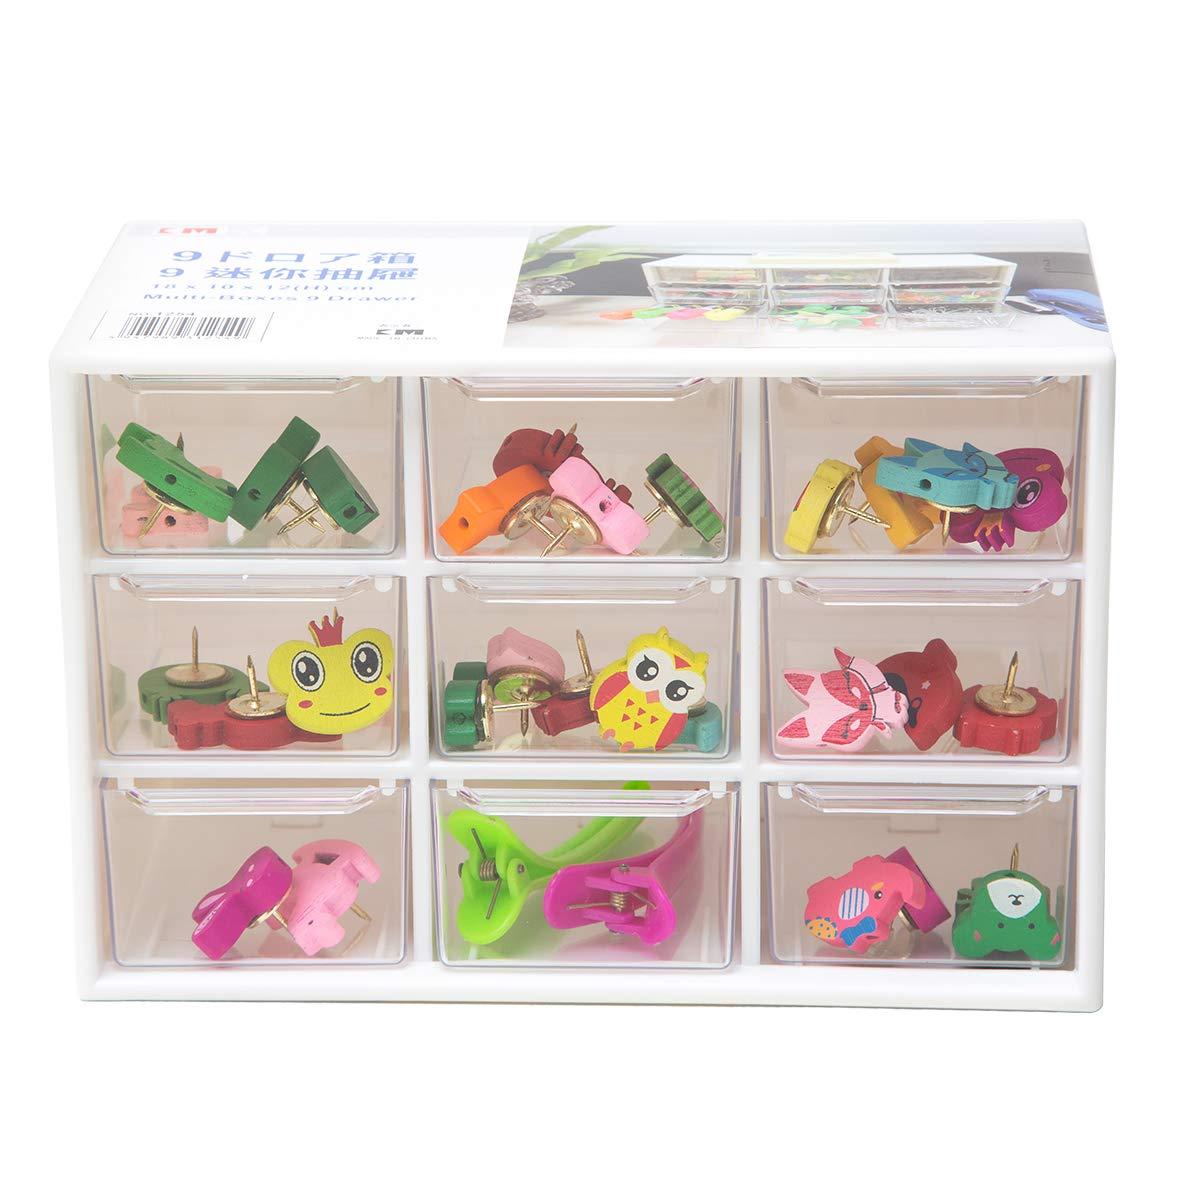 Chris-Wang Removeable Mini Acrylic 9 Drawer Desktop Storage Organizer/Collection Caddy/Small Belongings Holder/Art Craft Sorter, 18*10*12cm, White